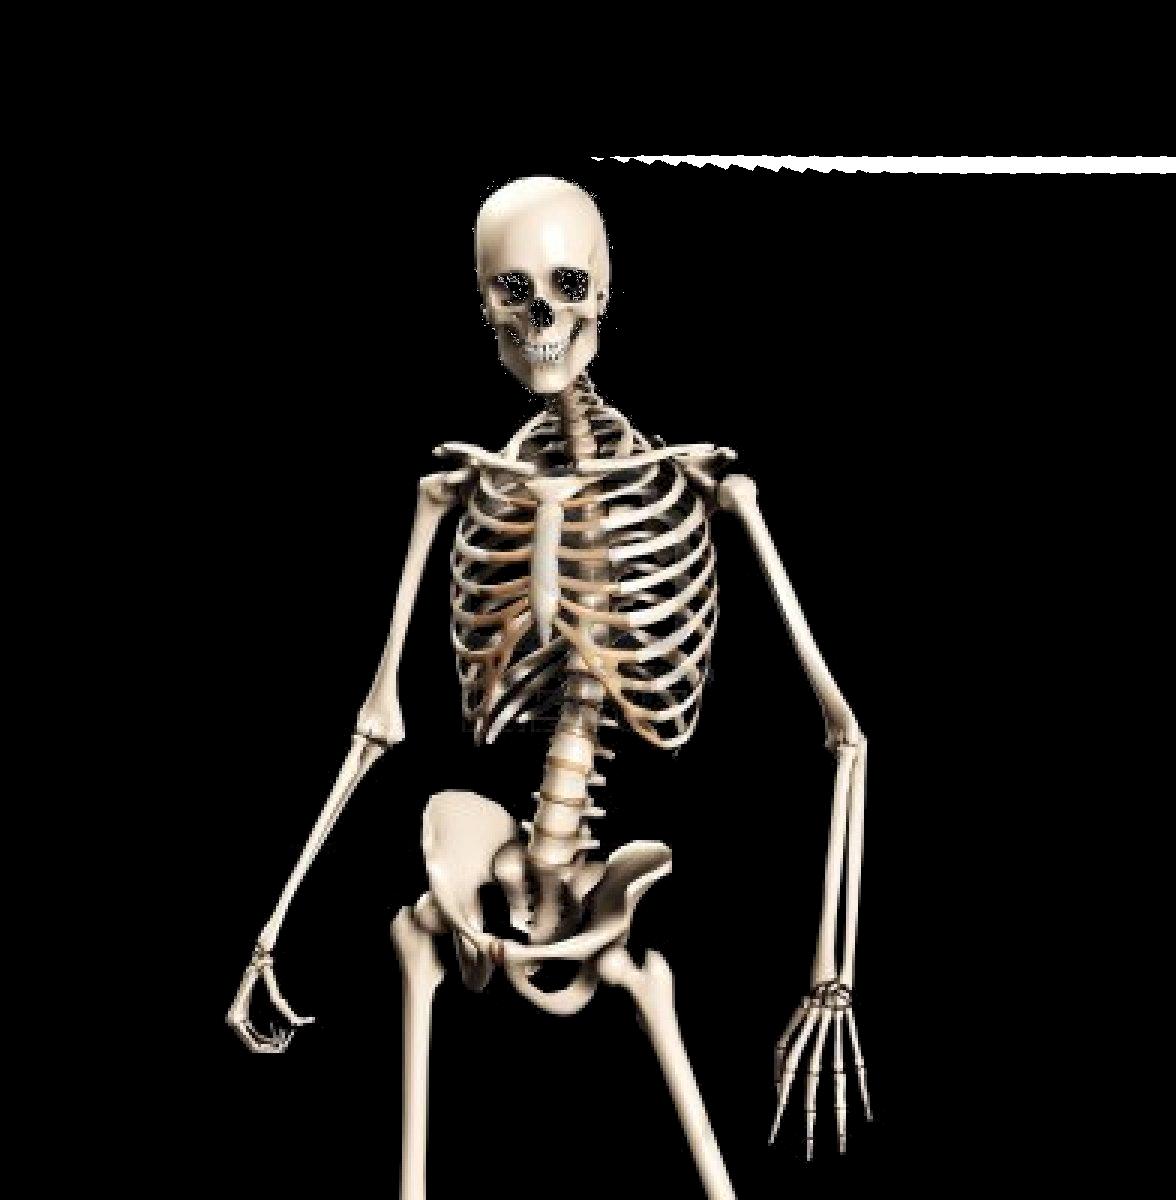 freeuse library Human skull bones anatomy. Bone transparent skeleton